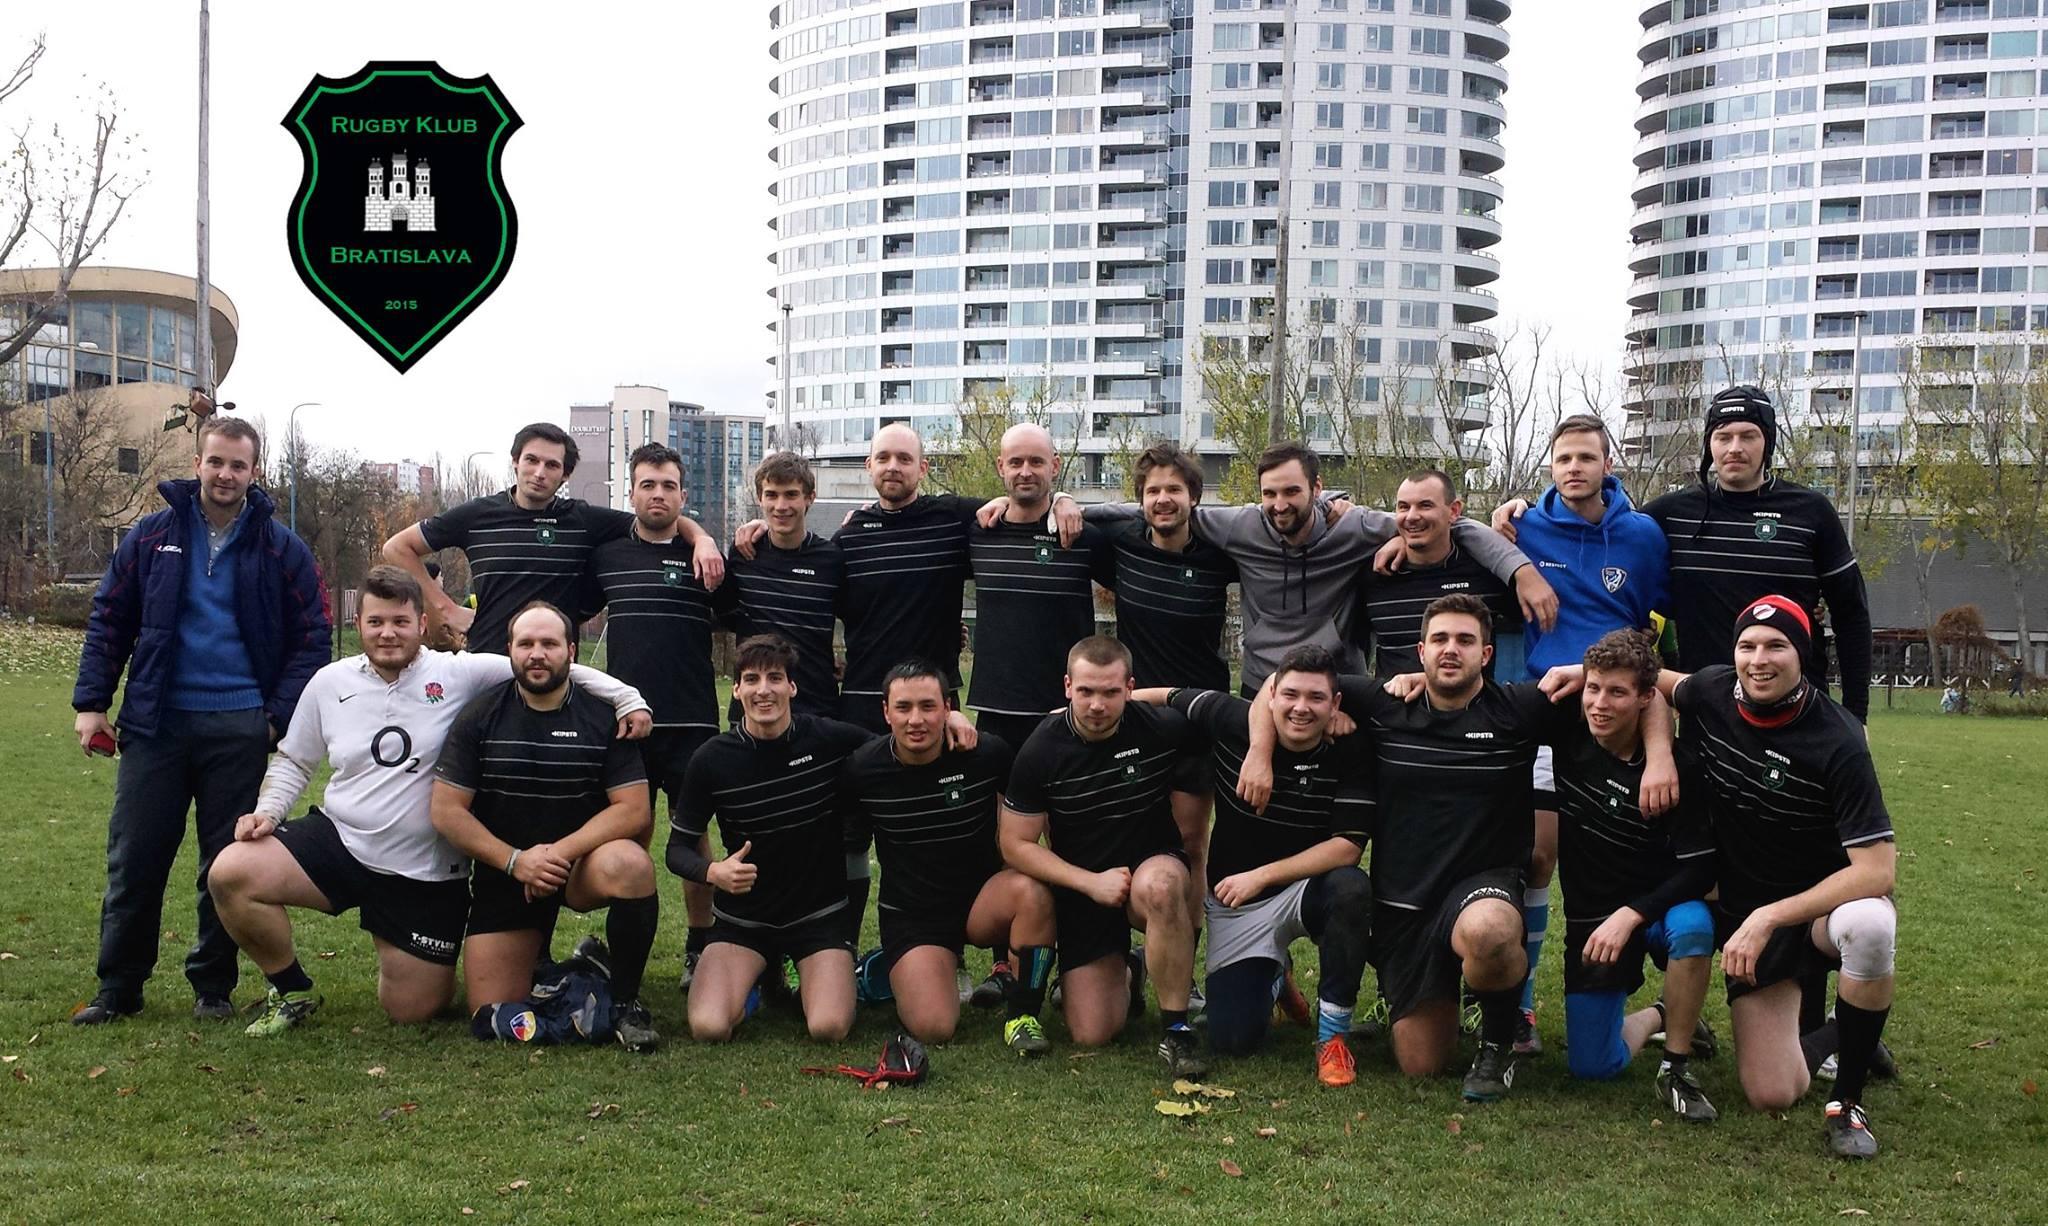 Rugby Klub Bratislava - 2016, Bratislava Ekonom